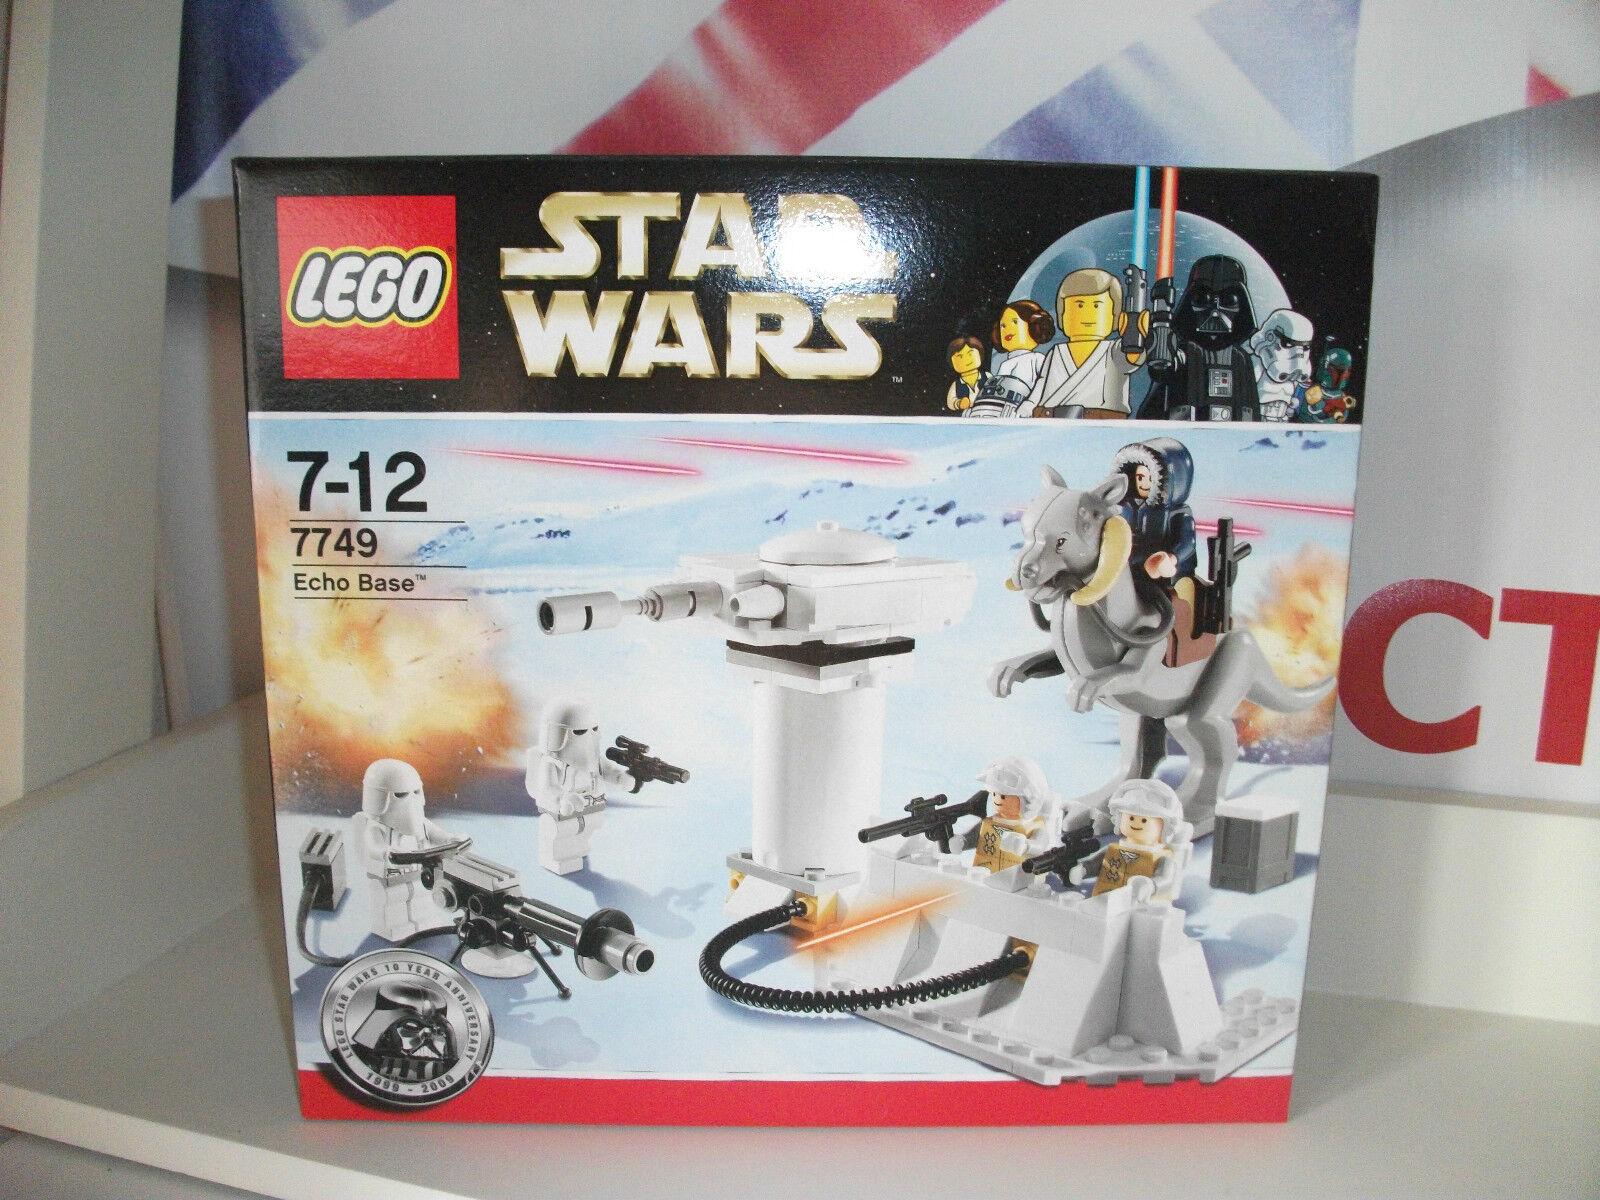 Star wars lego ECHO BASE BASE BASE snowtrooper han solo NEW MINT IN BOX. postage discoun baed91